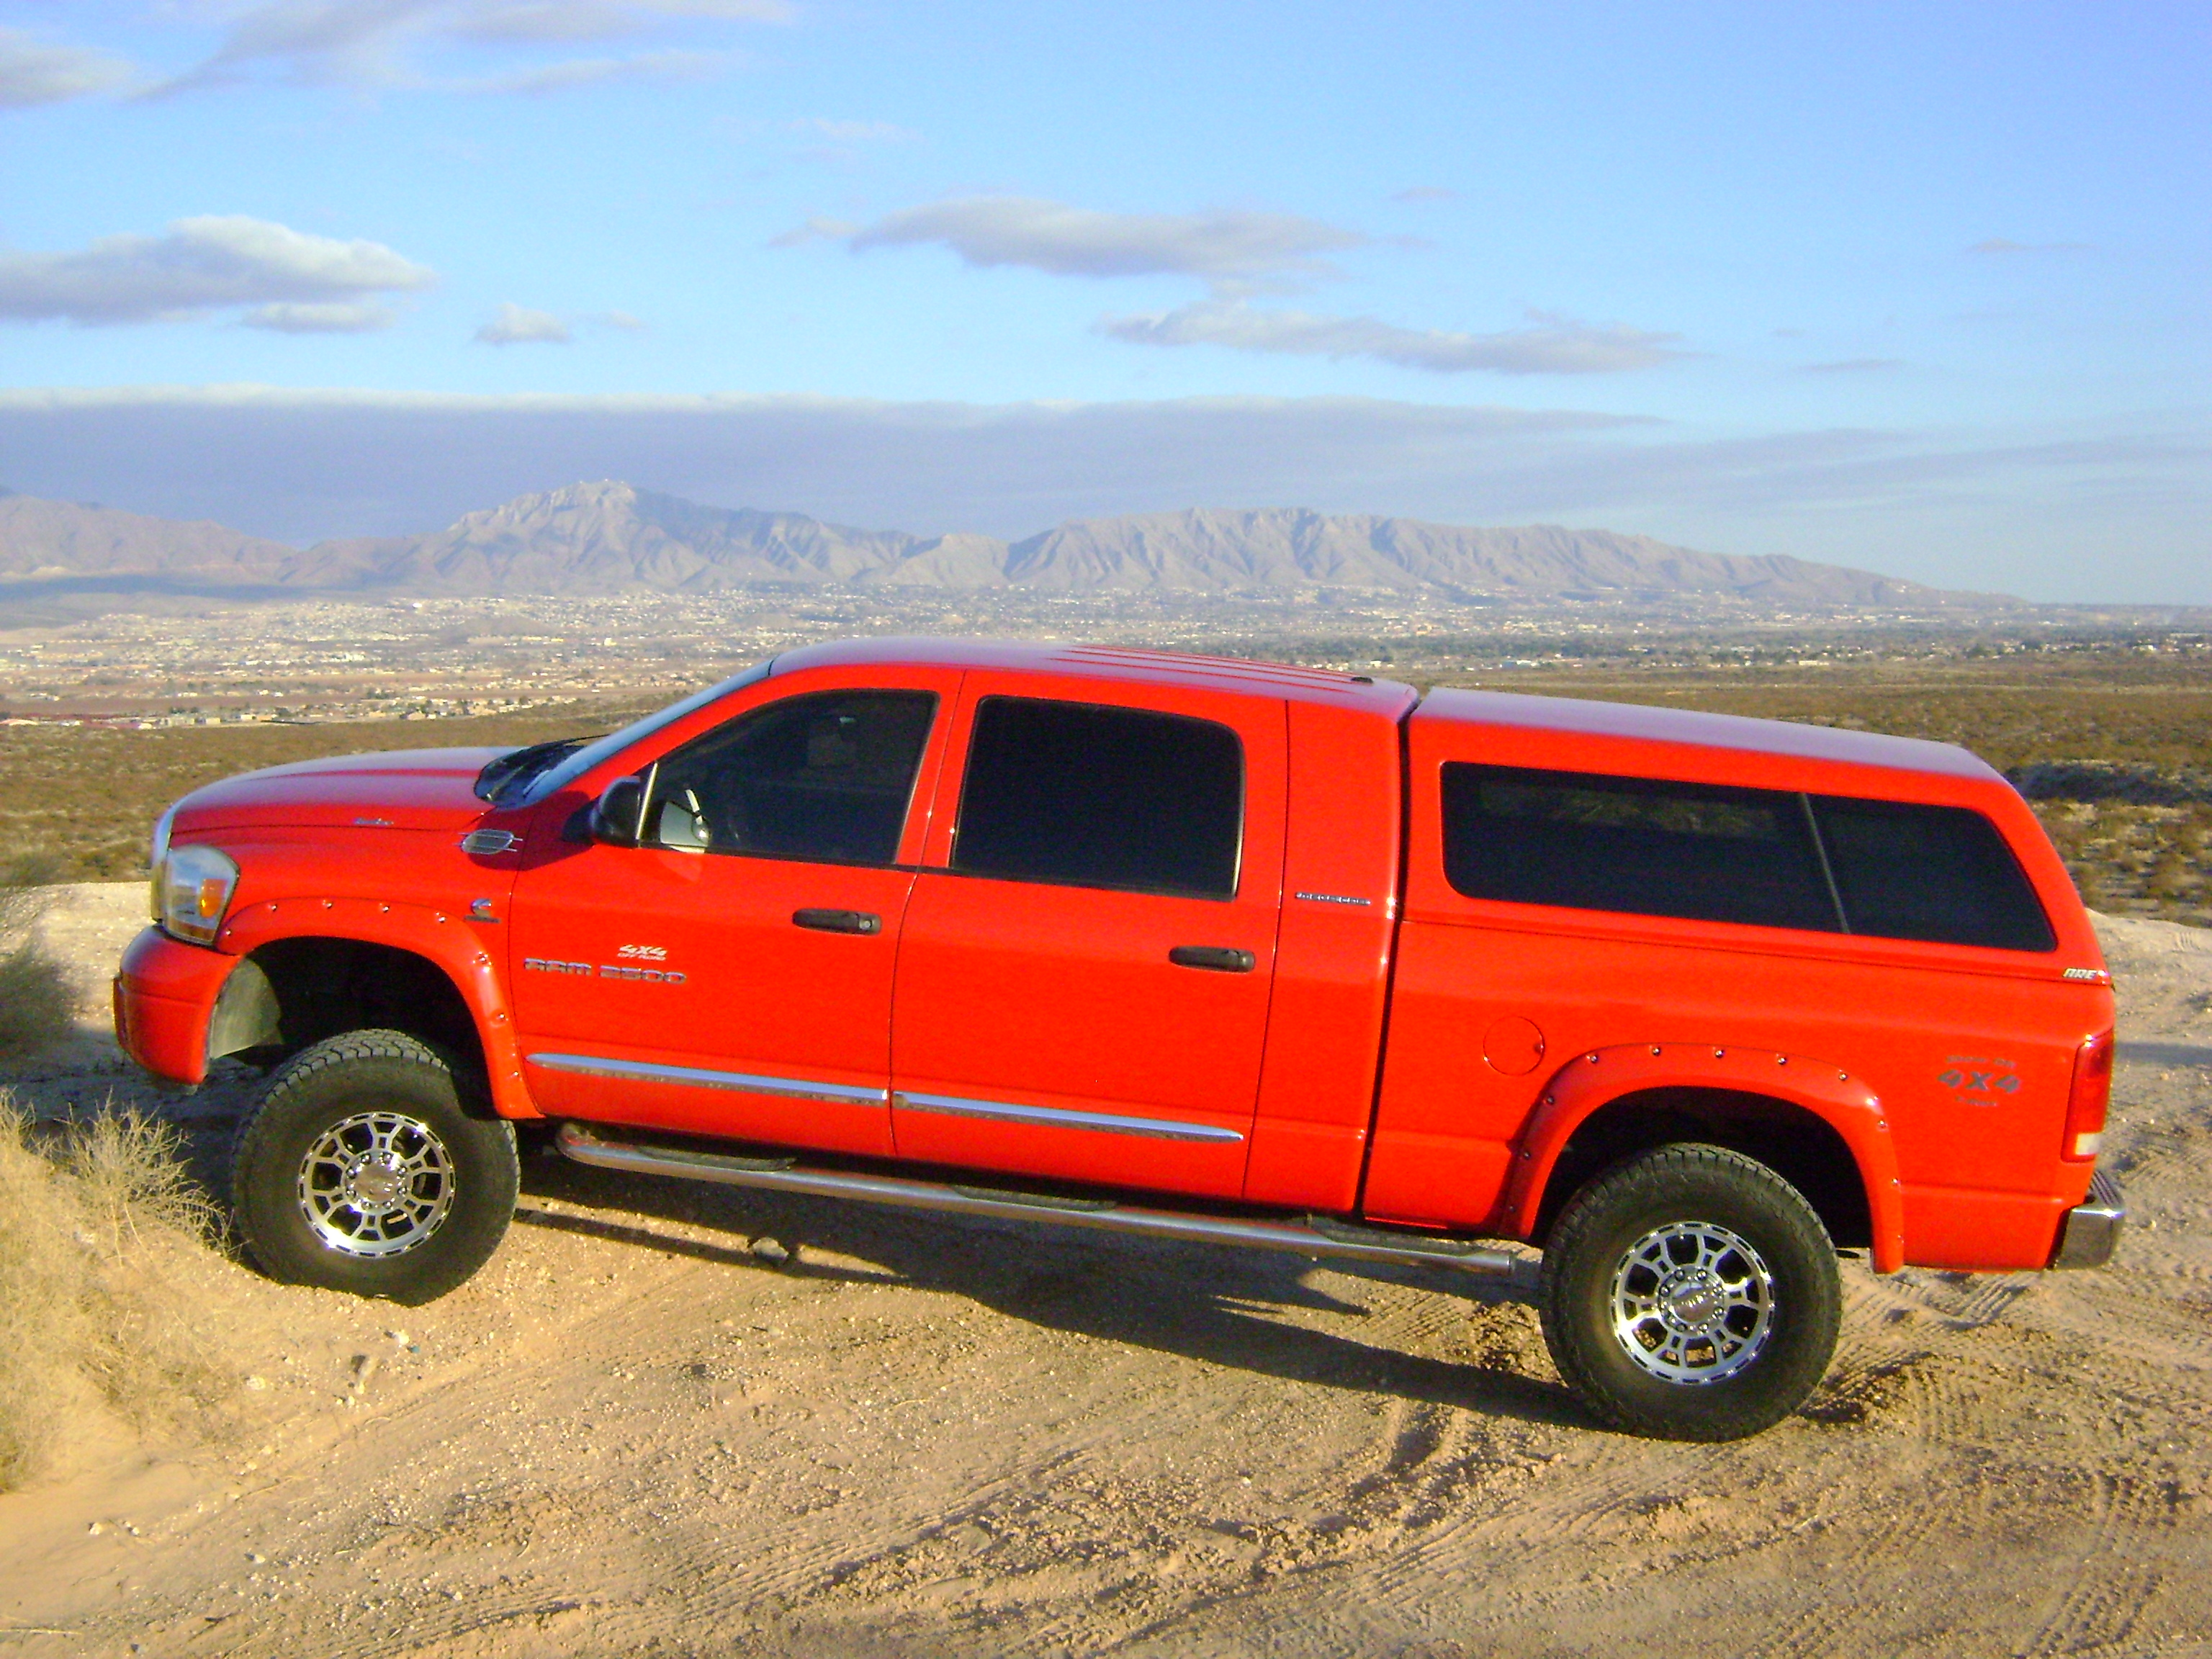 T Rex Truck Stuff 5510 N Desert Blvd Ste B El Paso TX YP